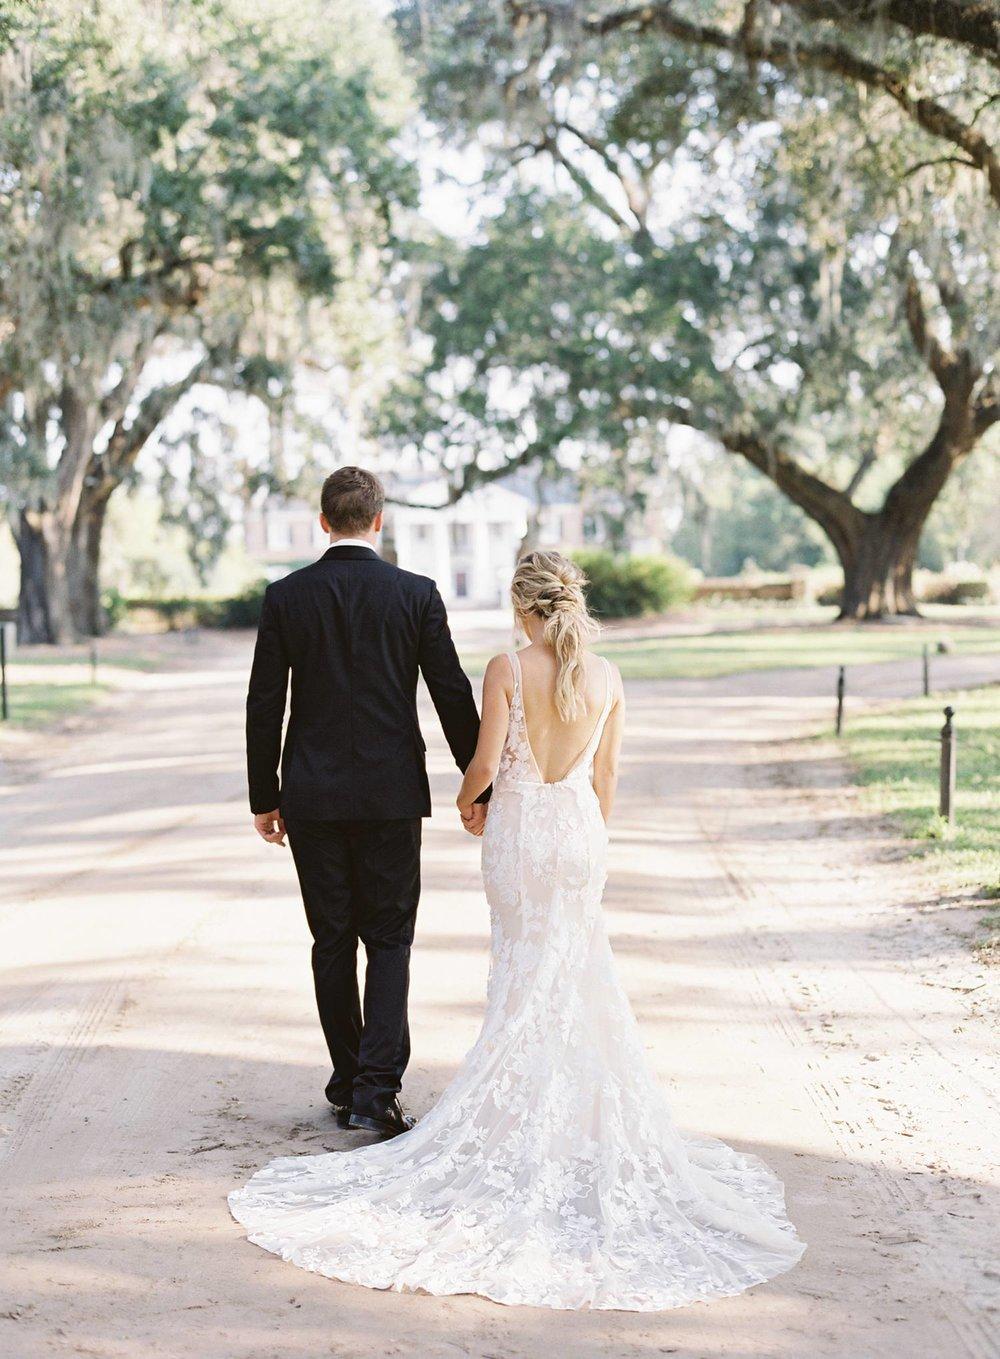 boonehallplantation_wedding_4.jpg